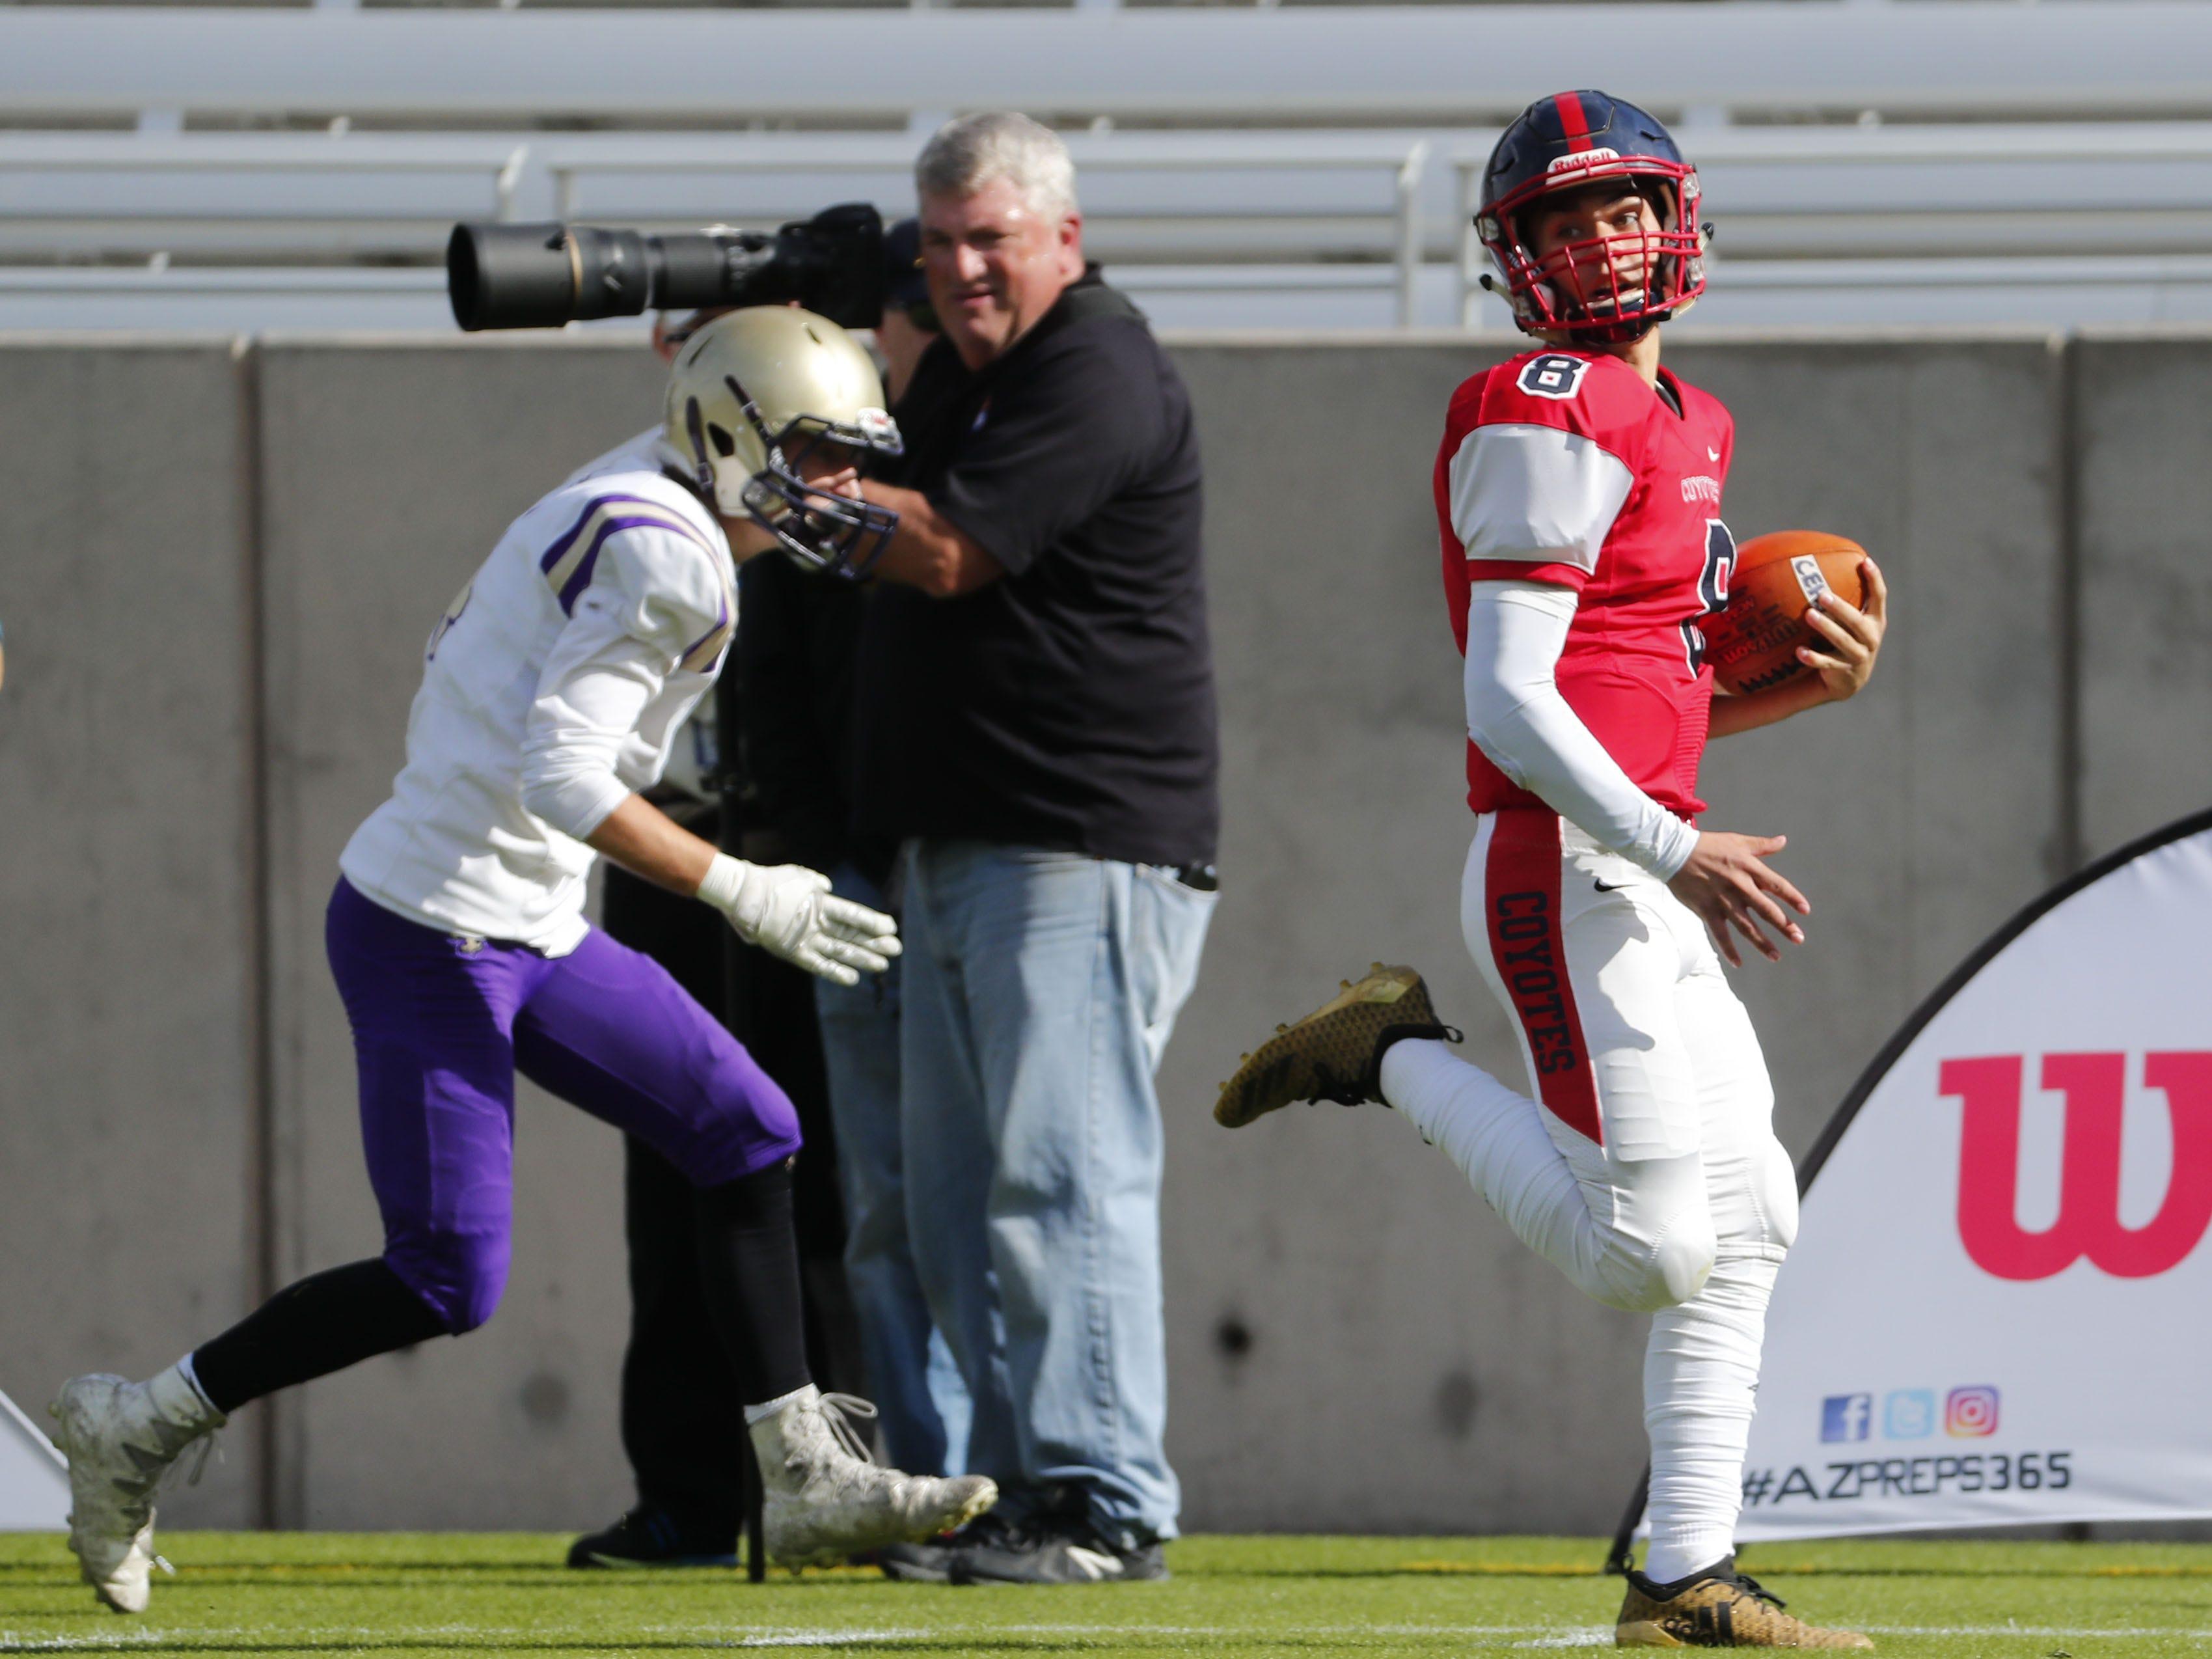 Centennial quarterback Jonathan Morris (8) looks back during a touchdown run against Notre Dame Prep cornerback Adam Boyer (4) during the 5A state football championship at Sun Devil Stadium December 1, 2018. #azhsfb